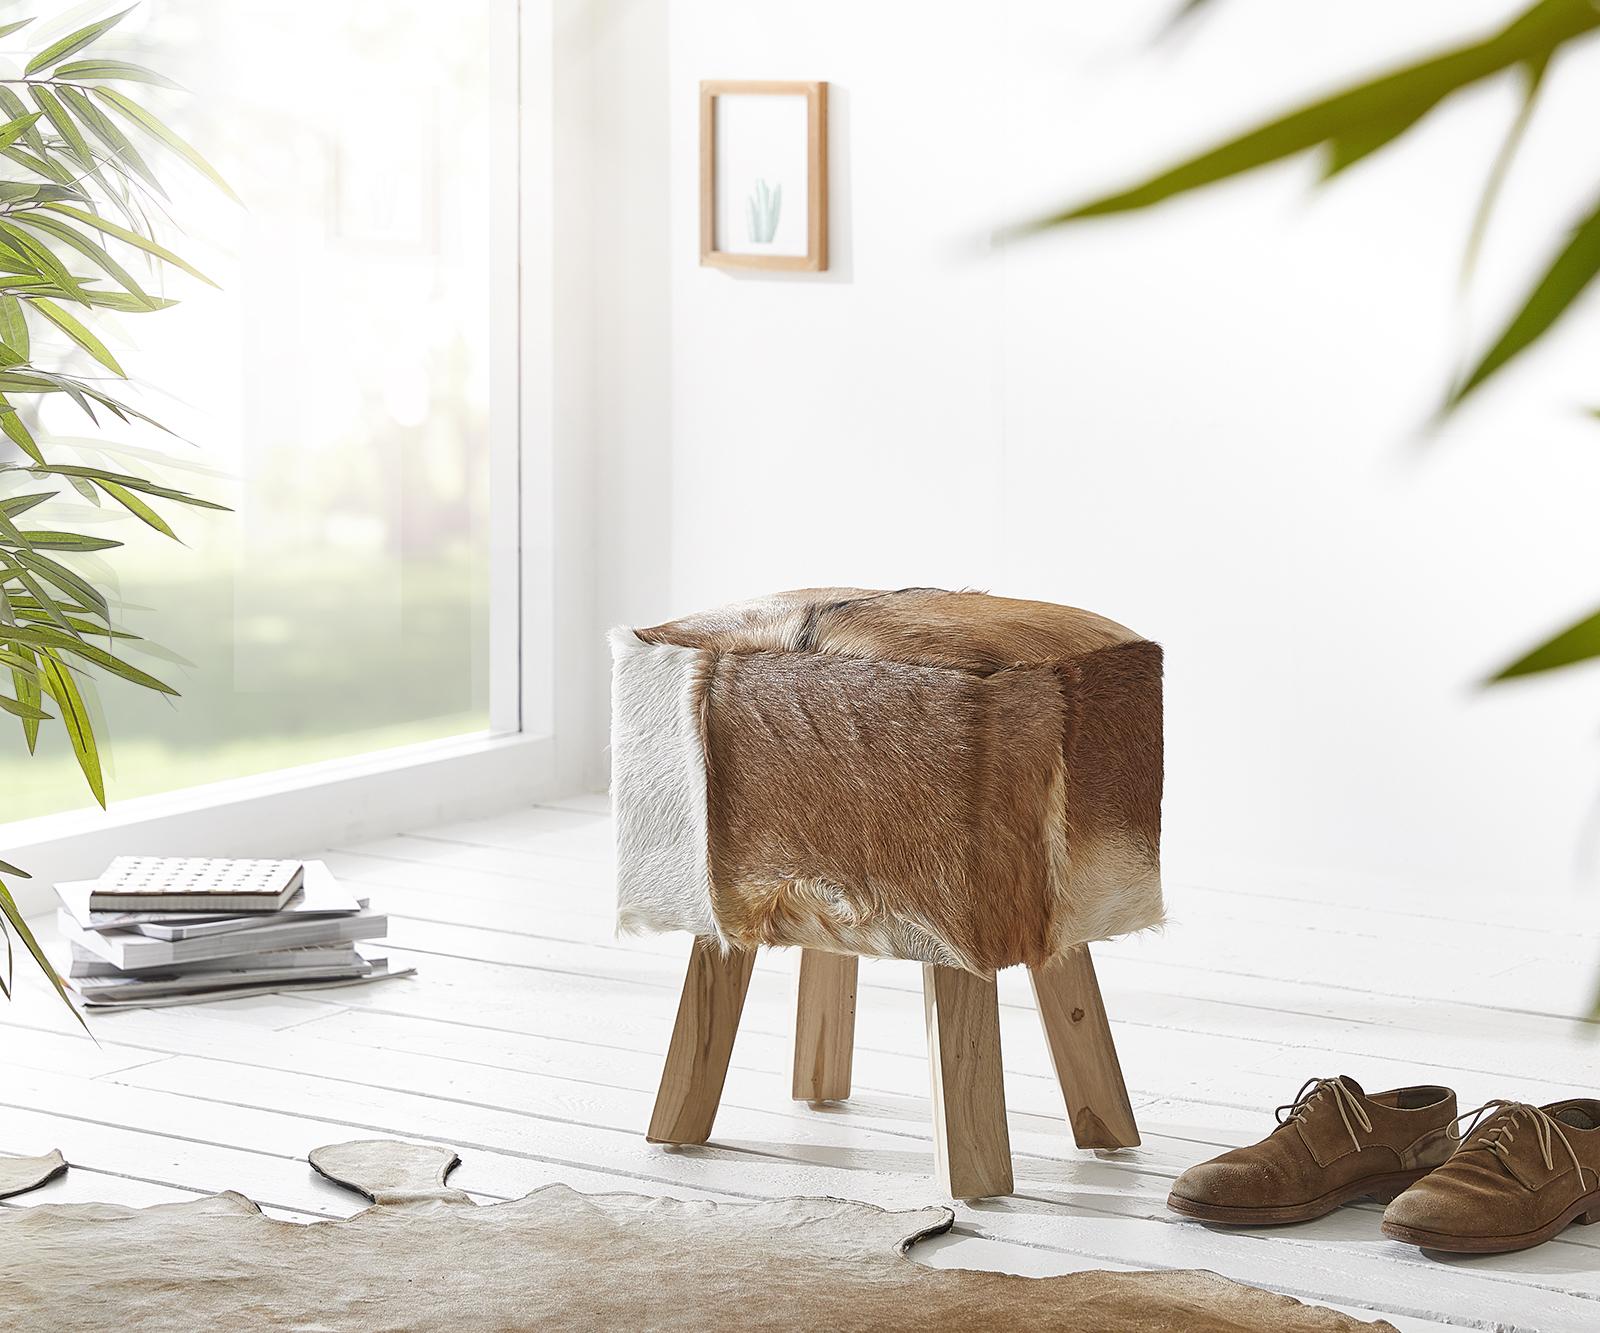 Sitzhocker Koza 40x30 cm Braun Ziegenfell Teakholz